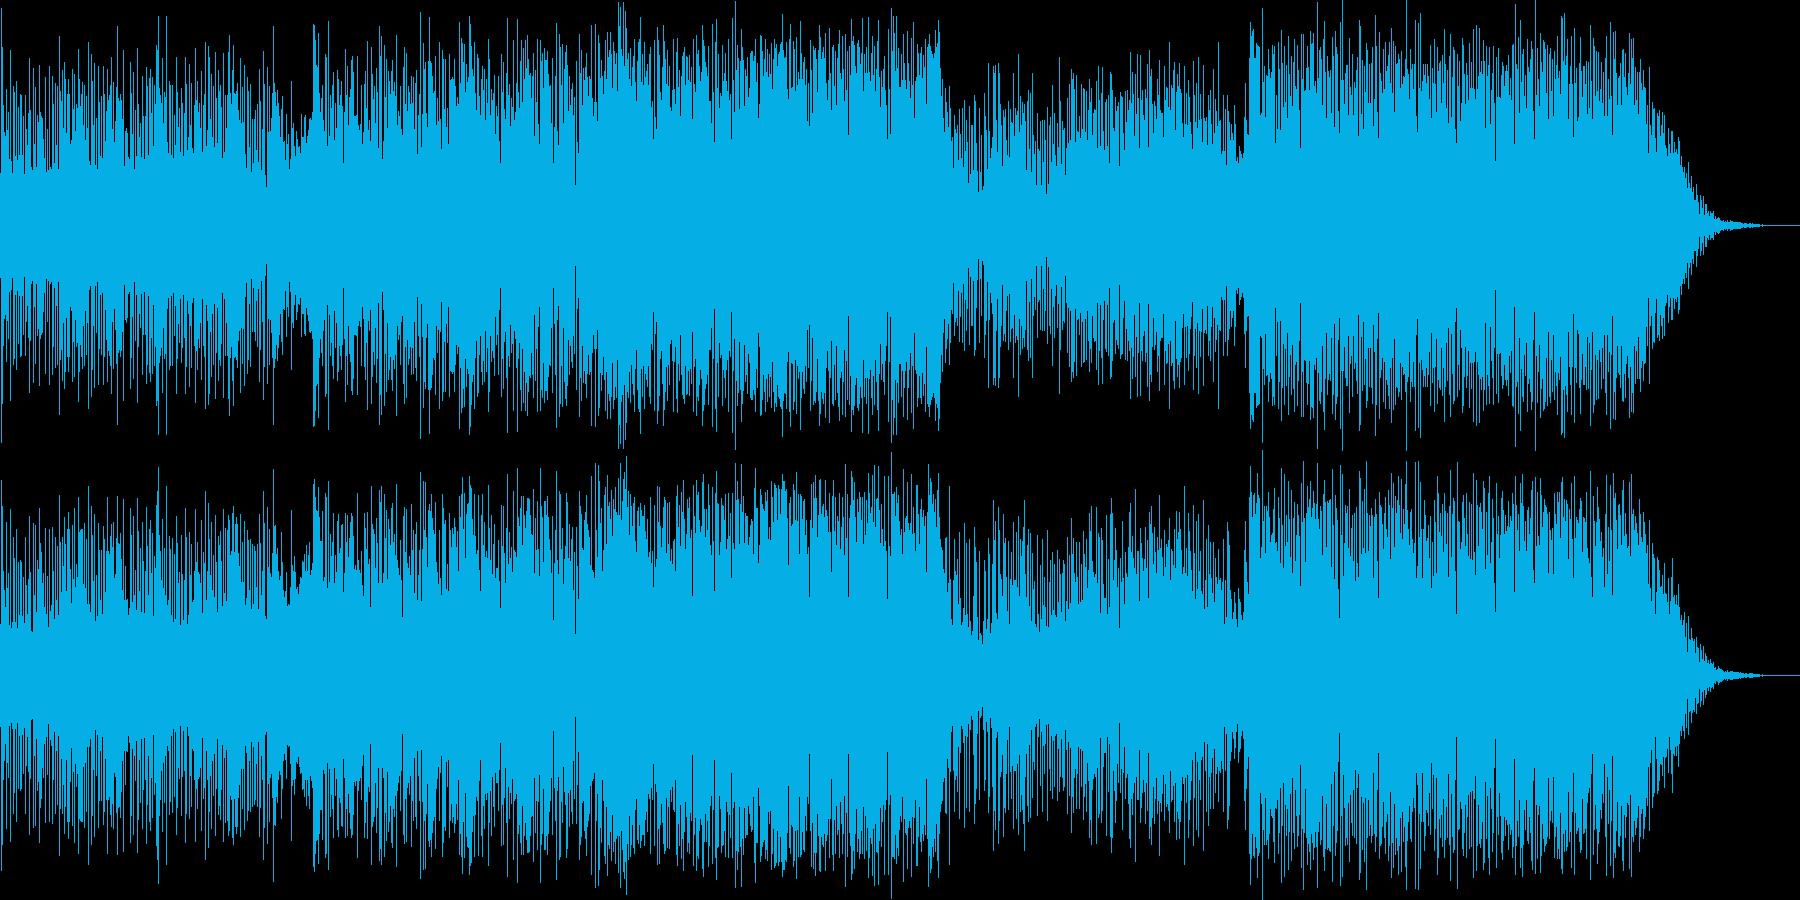 Jazz Funkの再生済みの波形